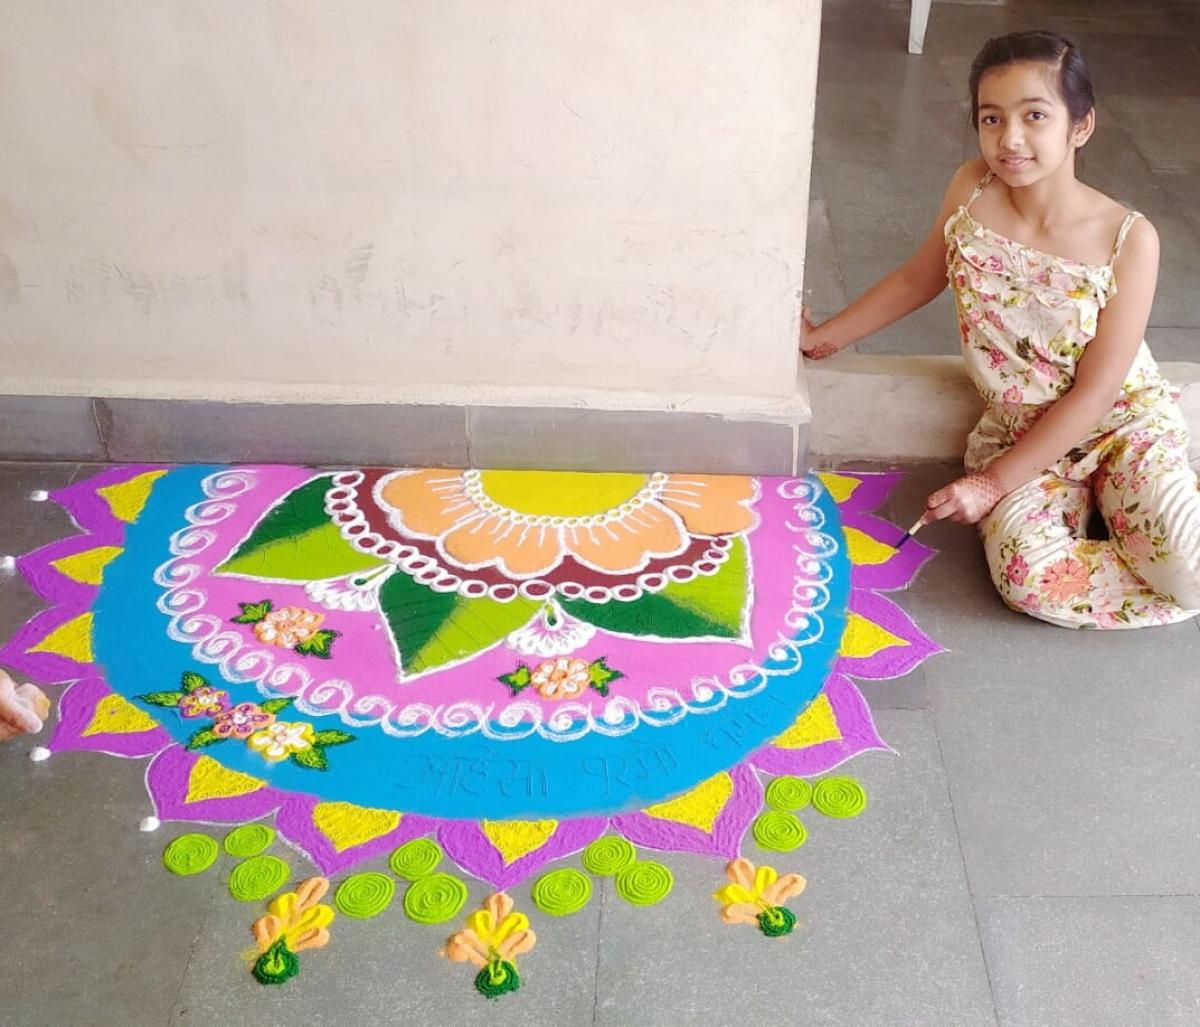 Ujjain: Corona impact; Jains hold symbolic celebrations on Mahavir Jayanti